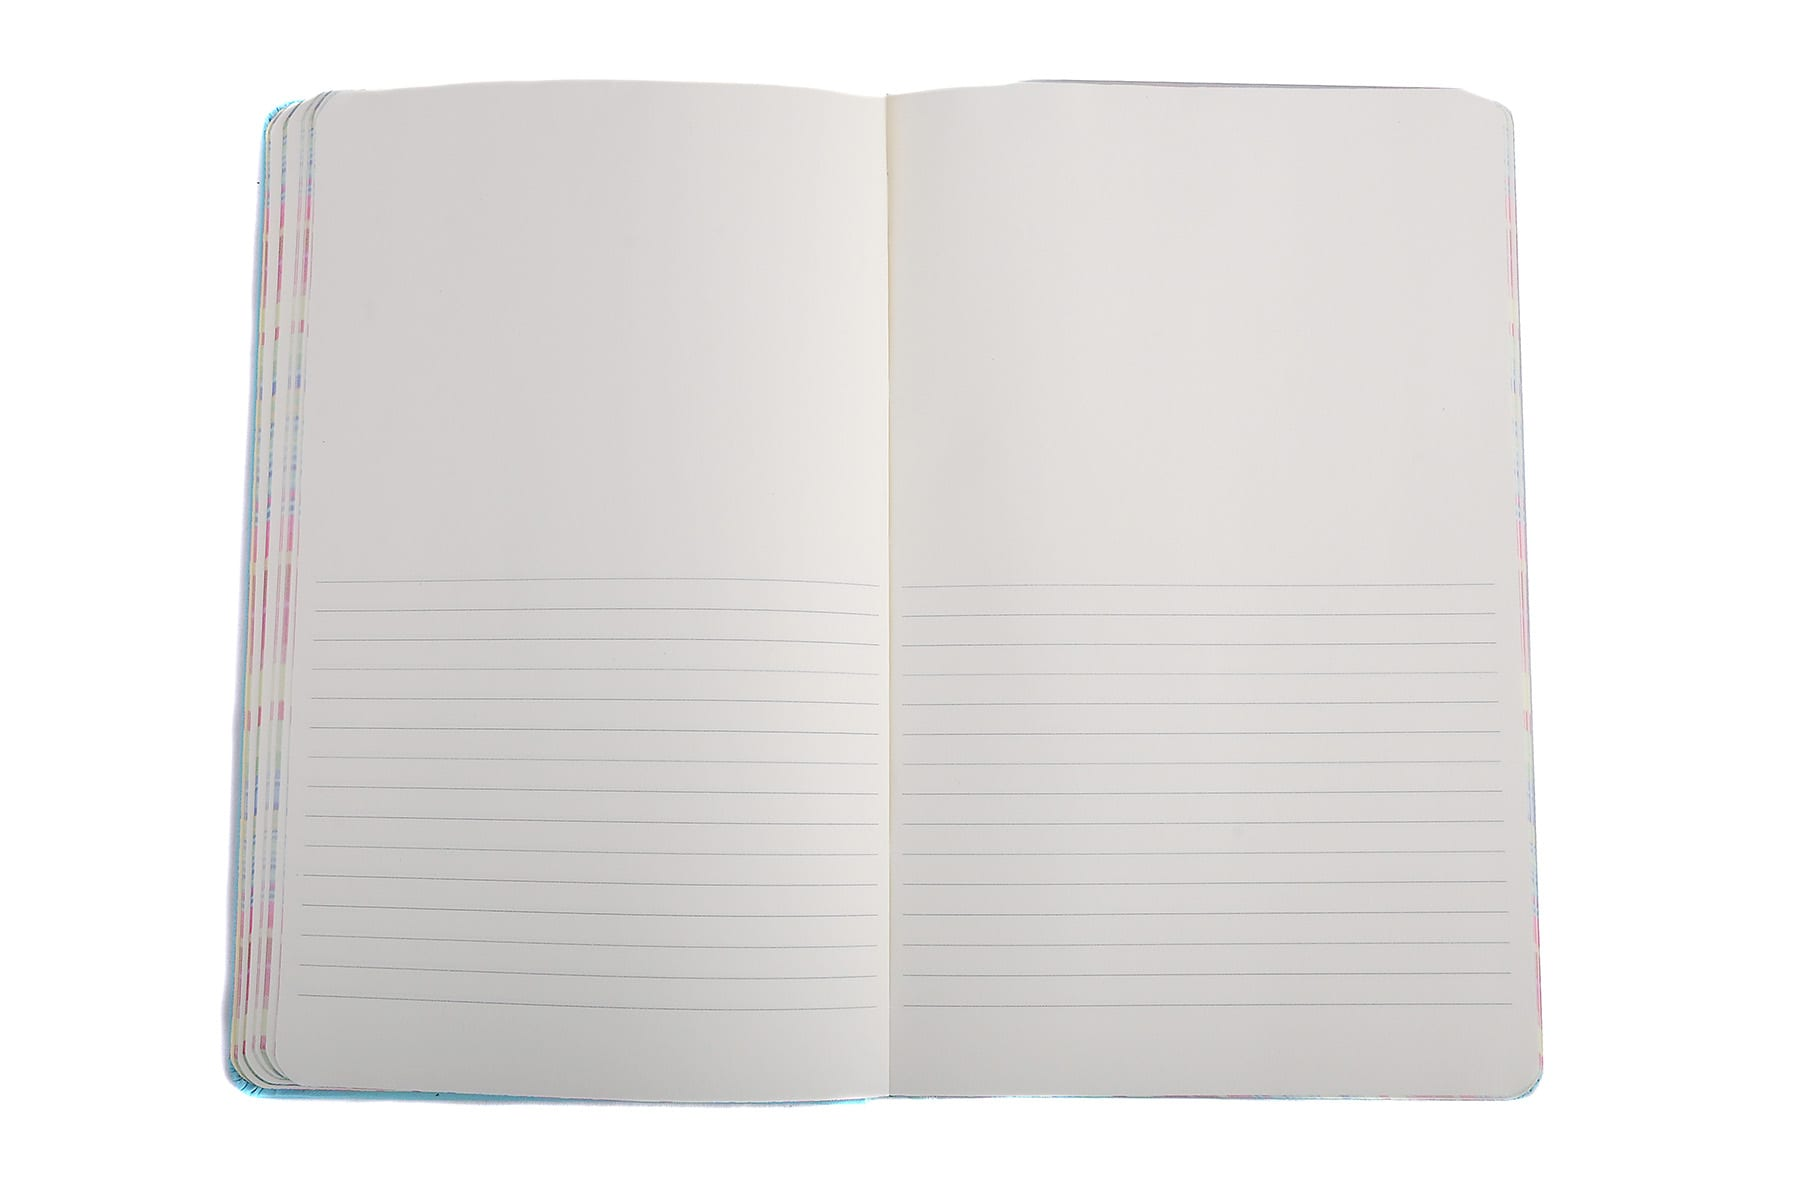 Half lined half plain page